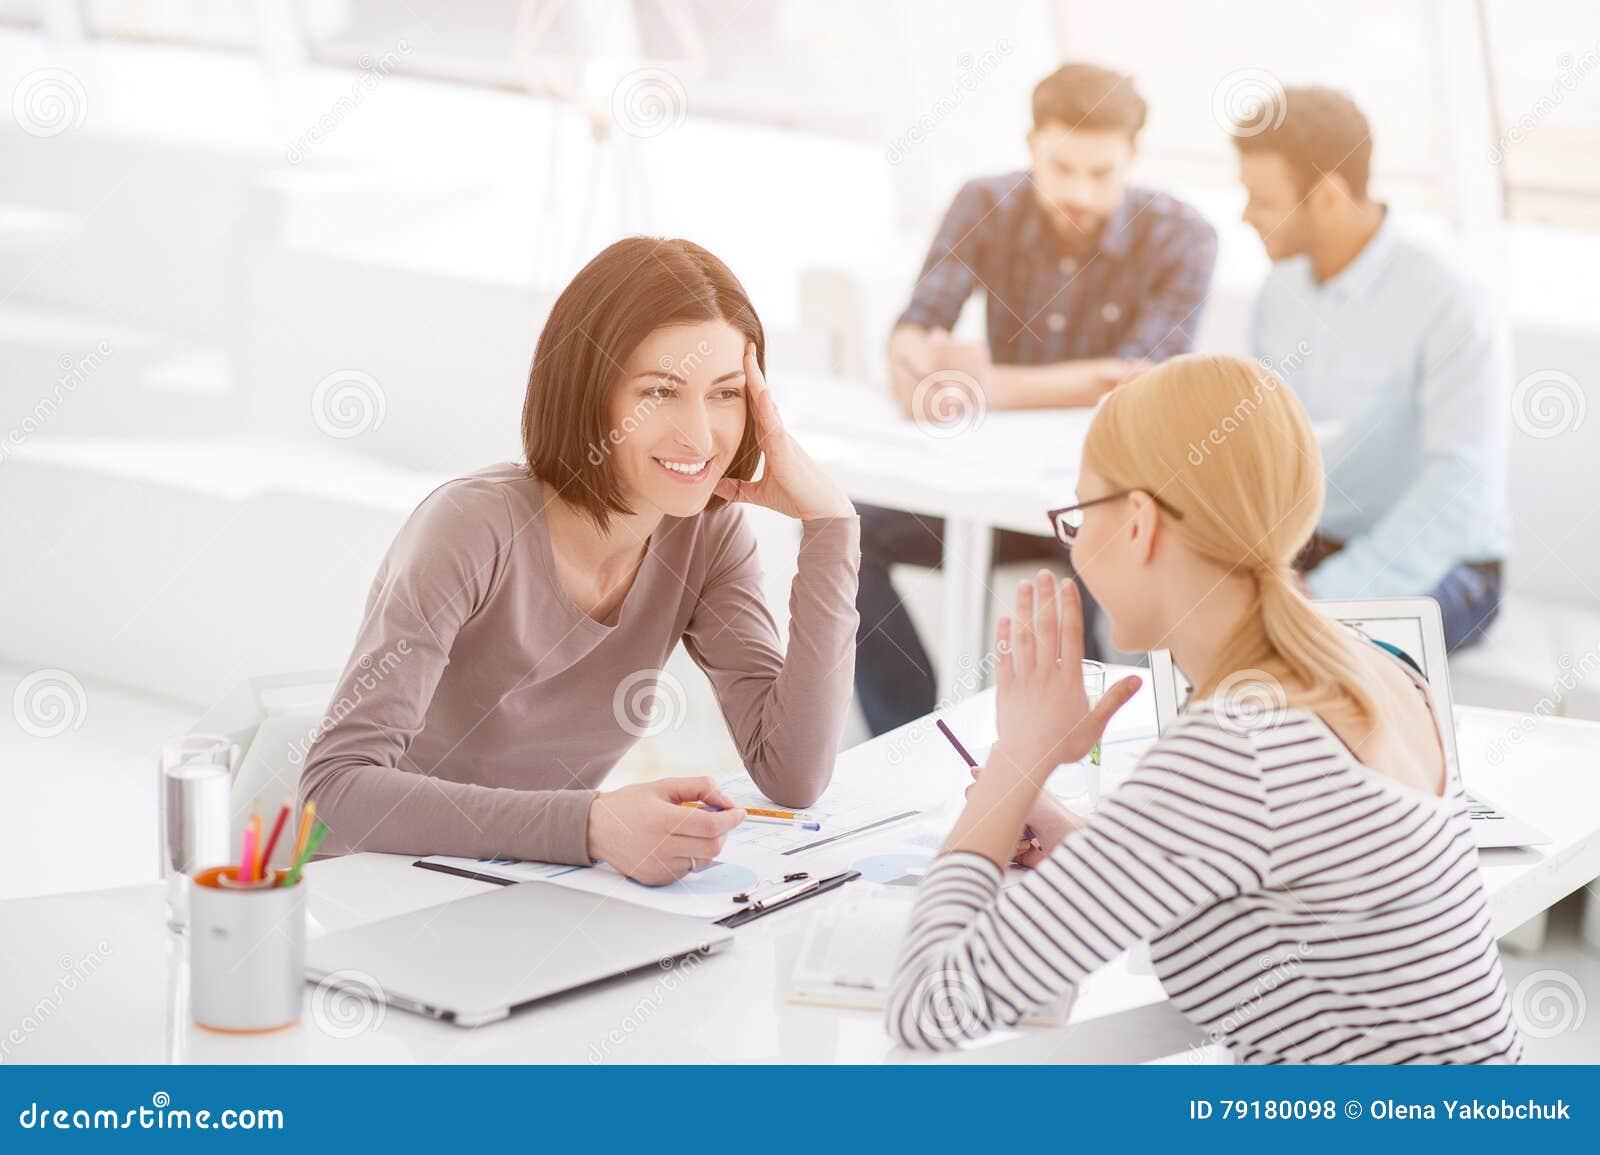 Twee vrouwen die samenwerken